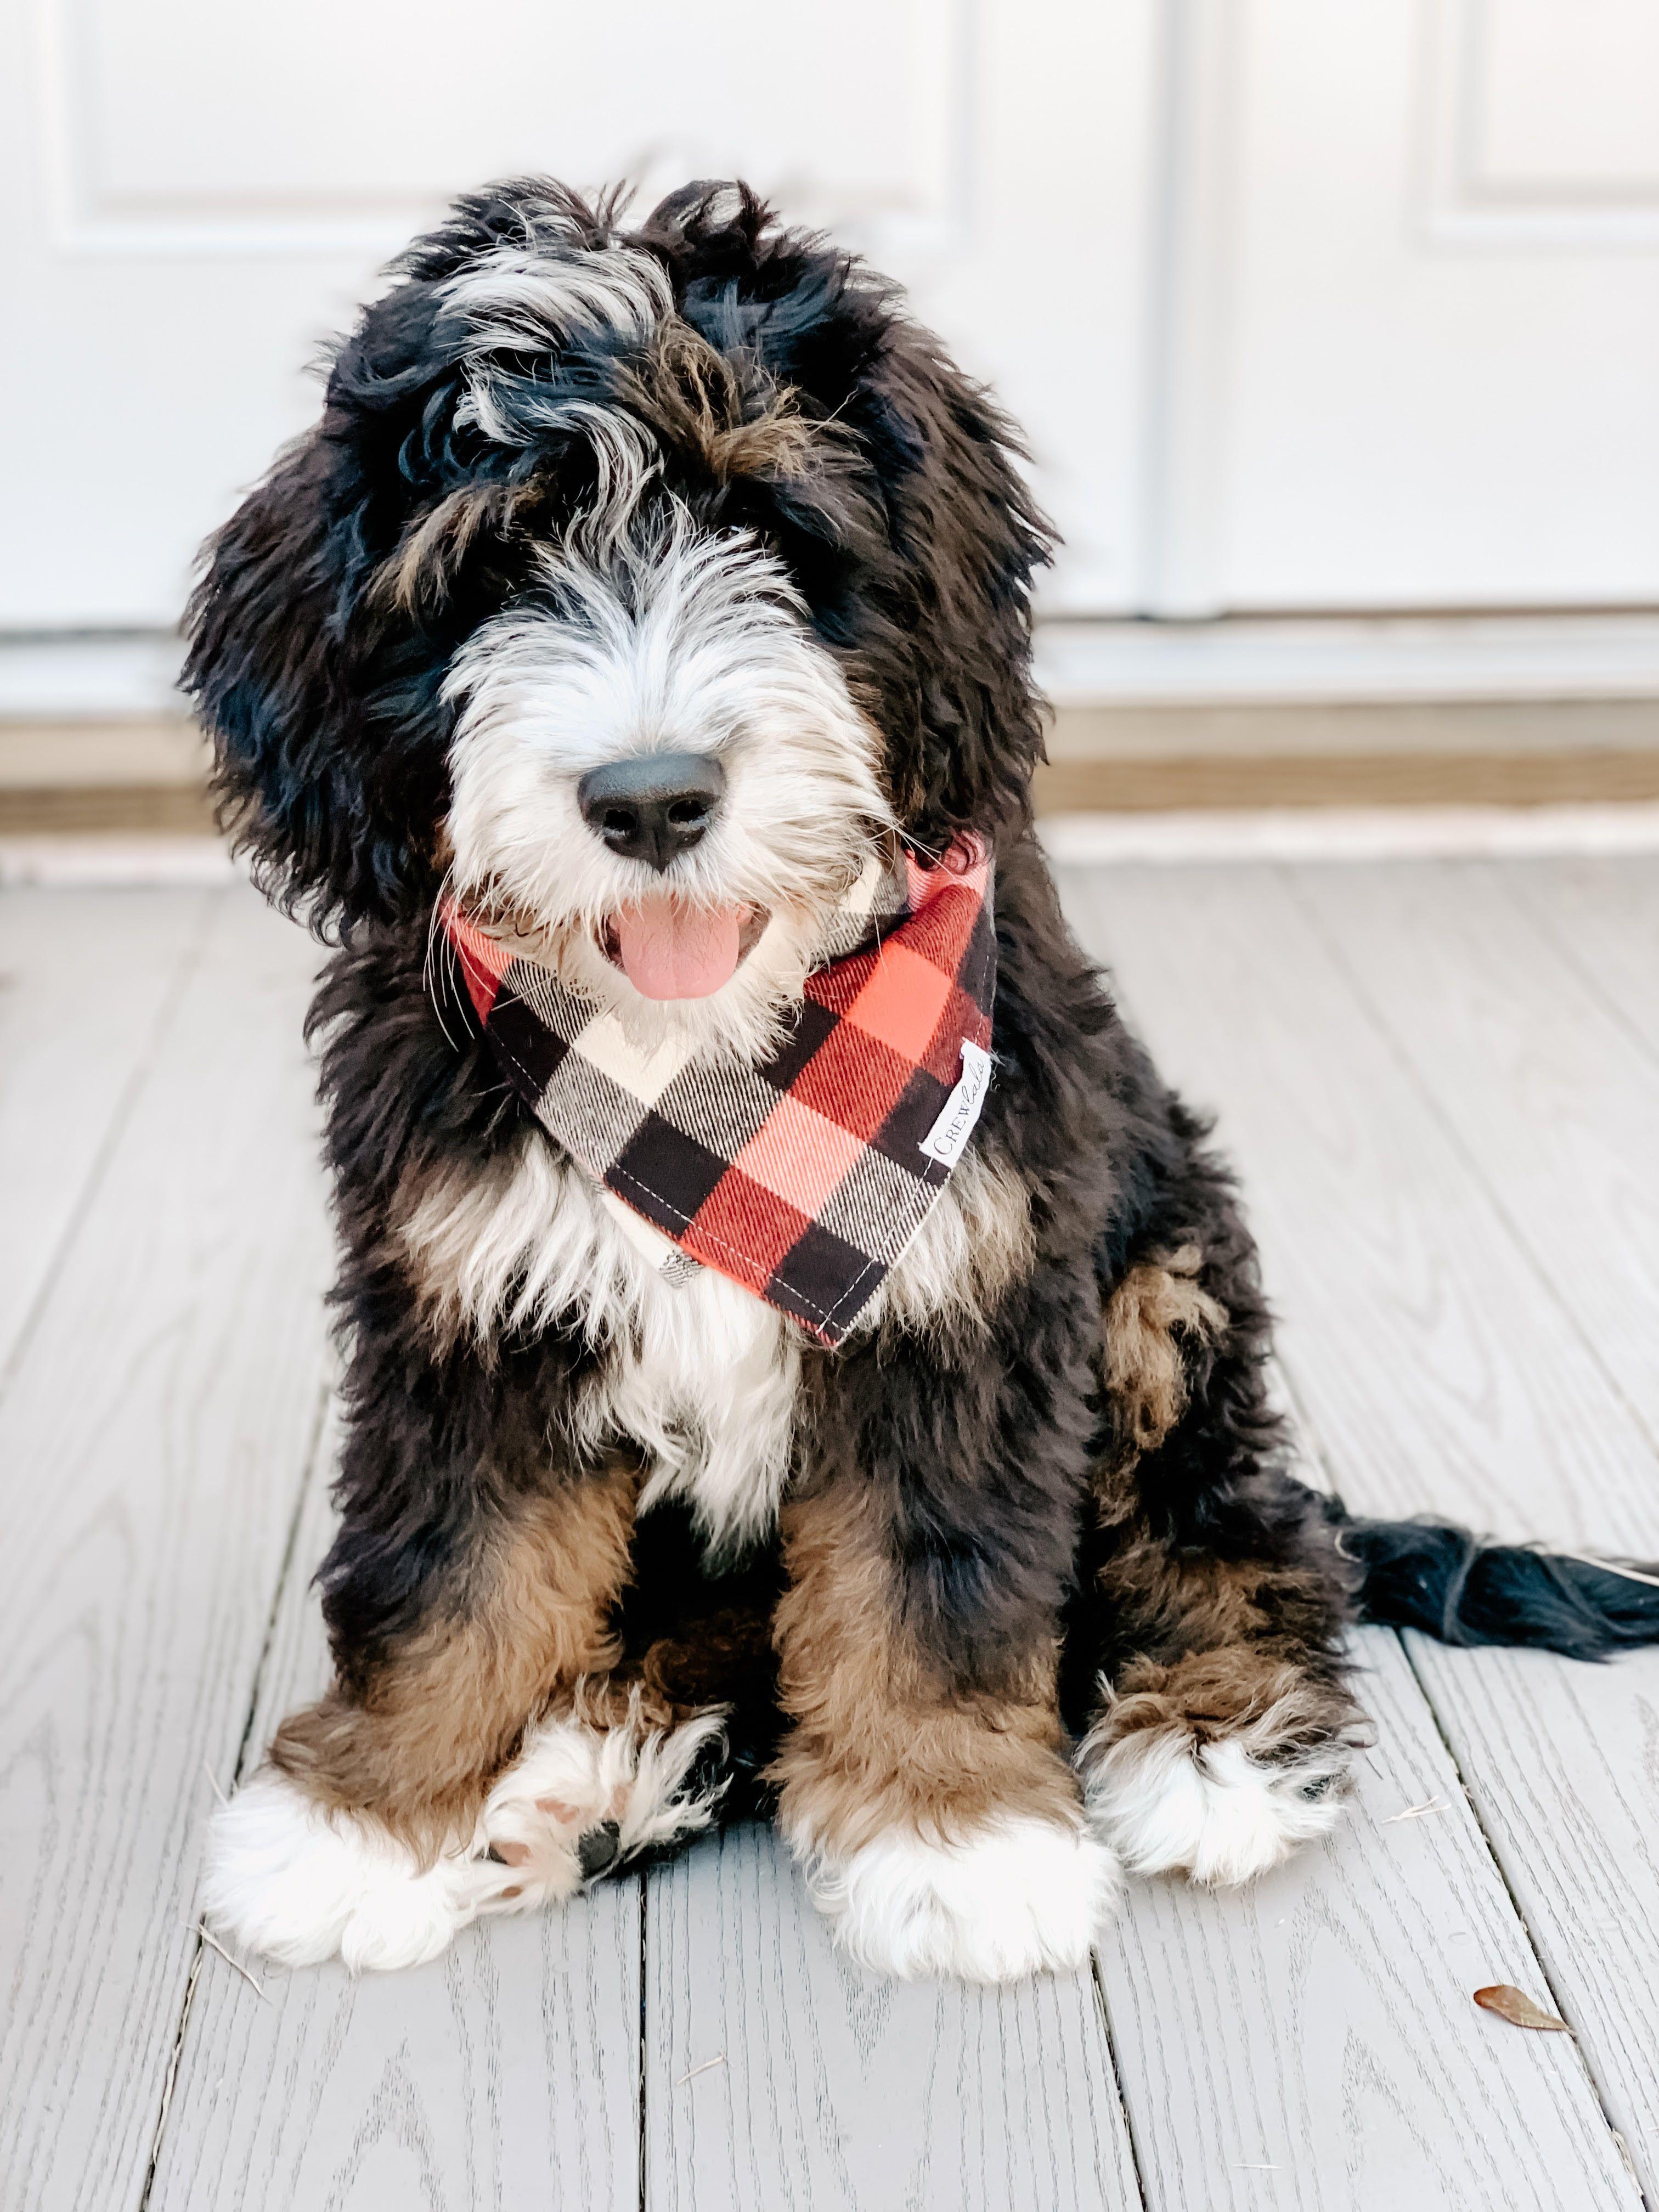 16 weeks old standard bernedoodle pup from swissridge